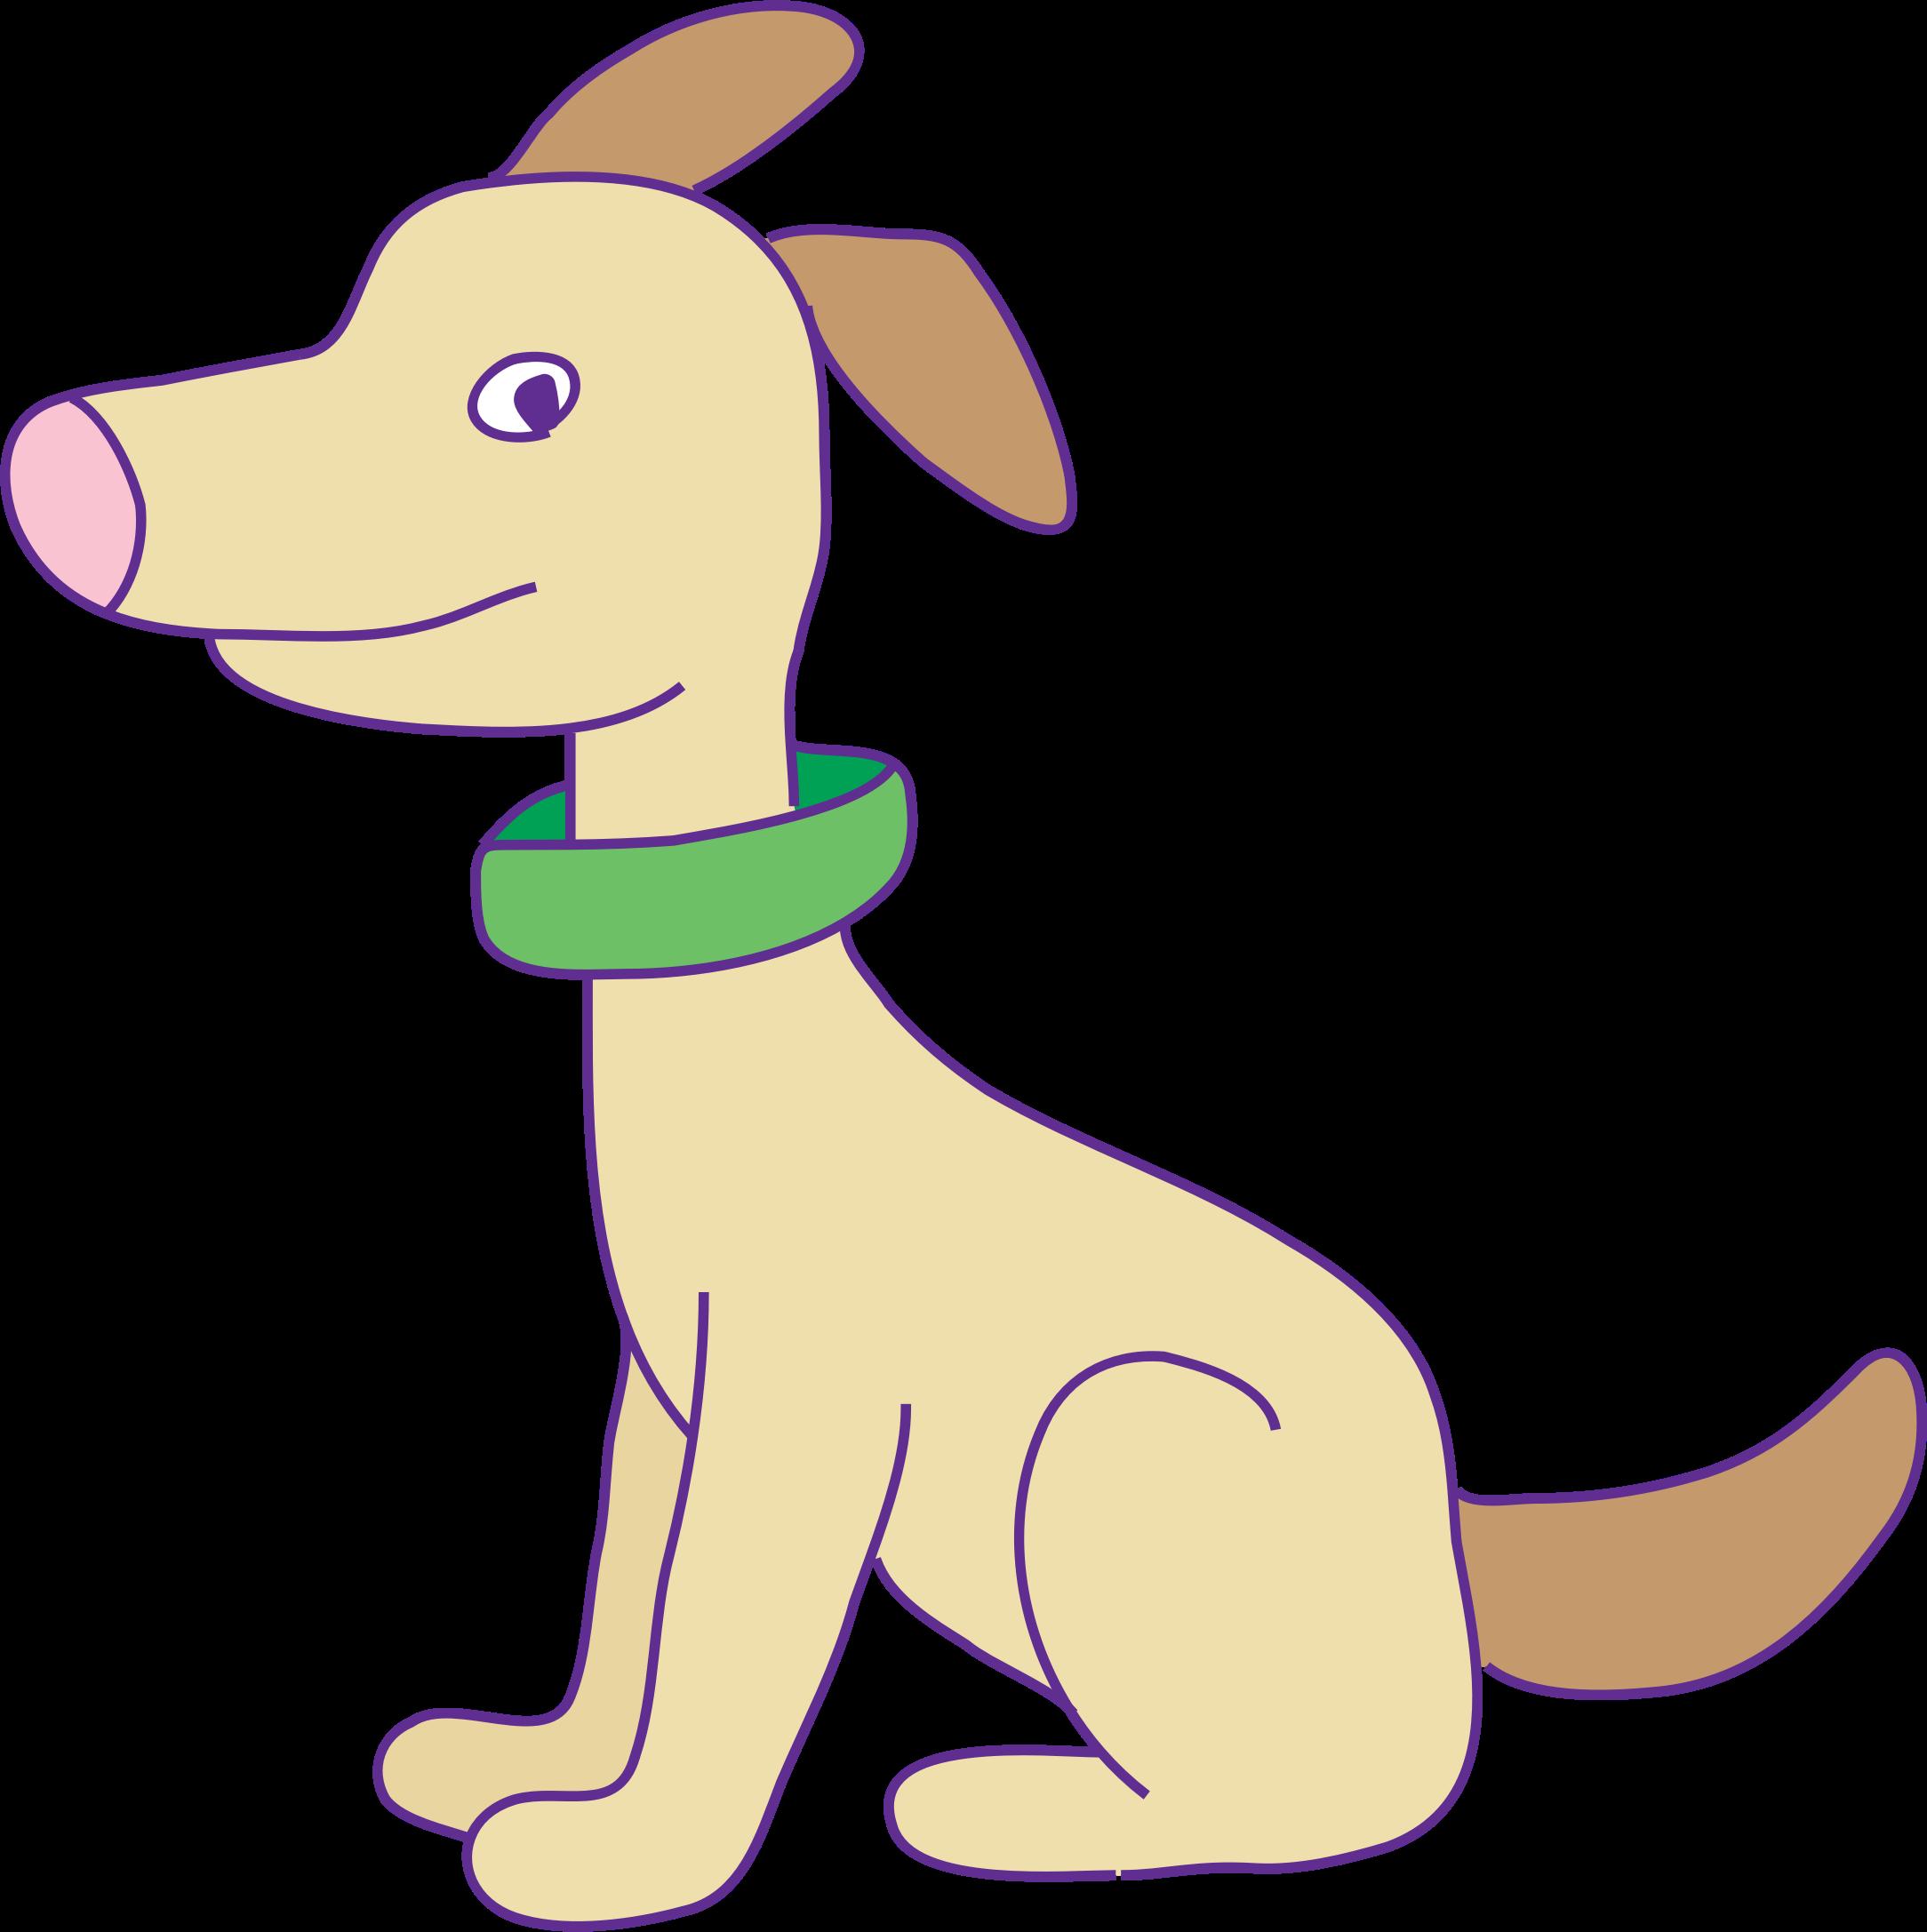 Microsoft clipart big dog graphic freeuse stock Clipart - dog كلب graphic freeuse stock